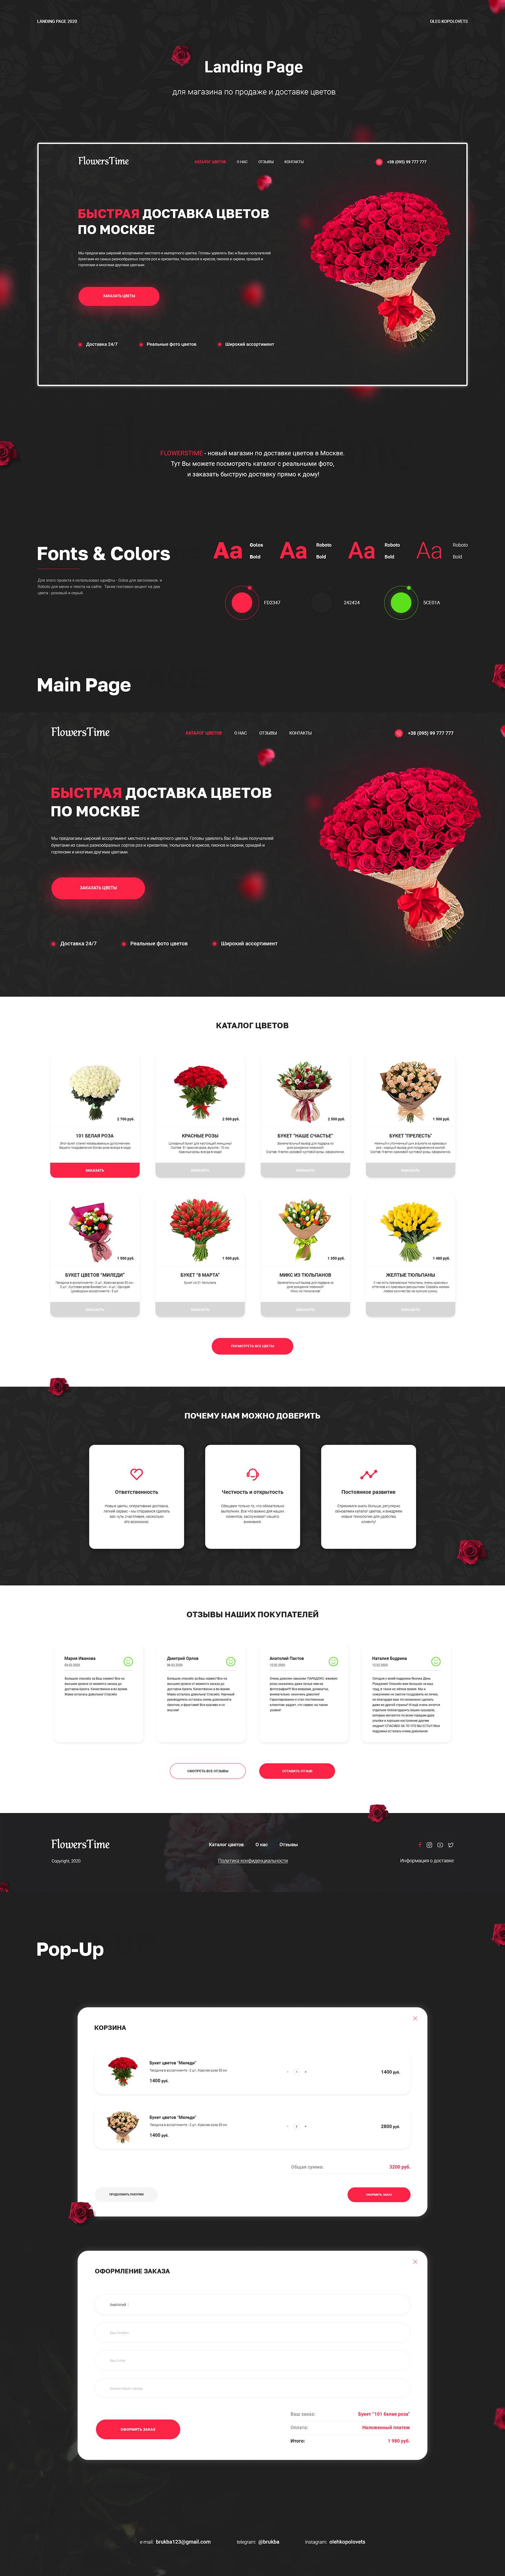 landing page web-design дизайн лендинг сайт